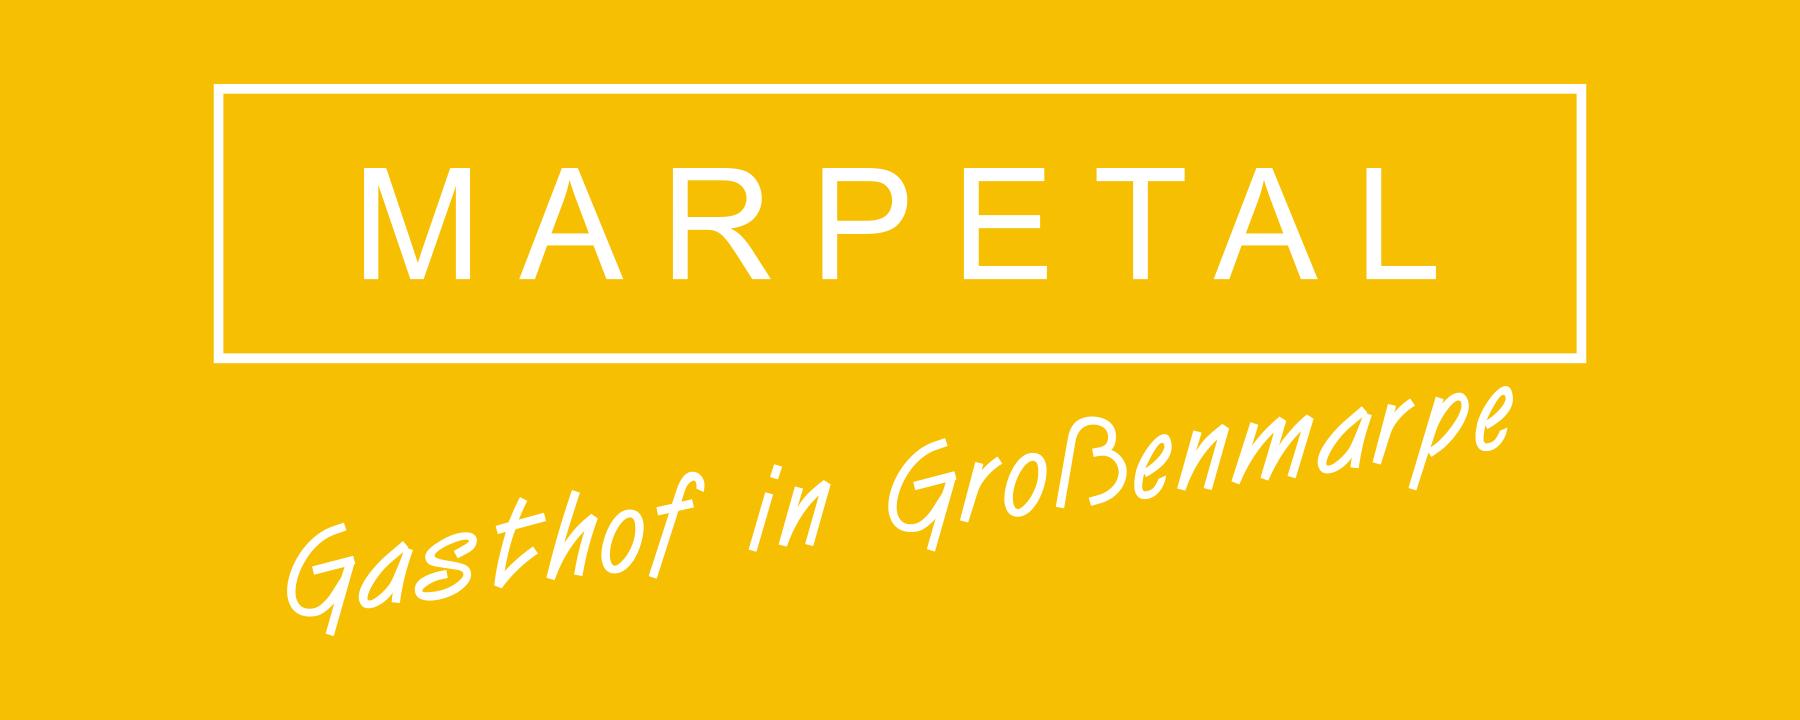 Marpetal - Gasthof in Großenmarpe